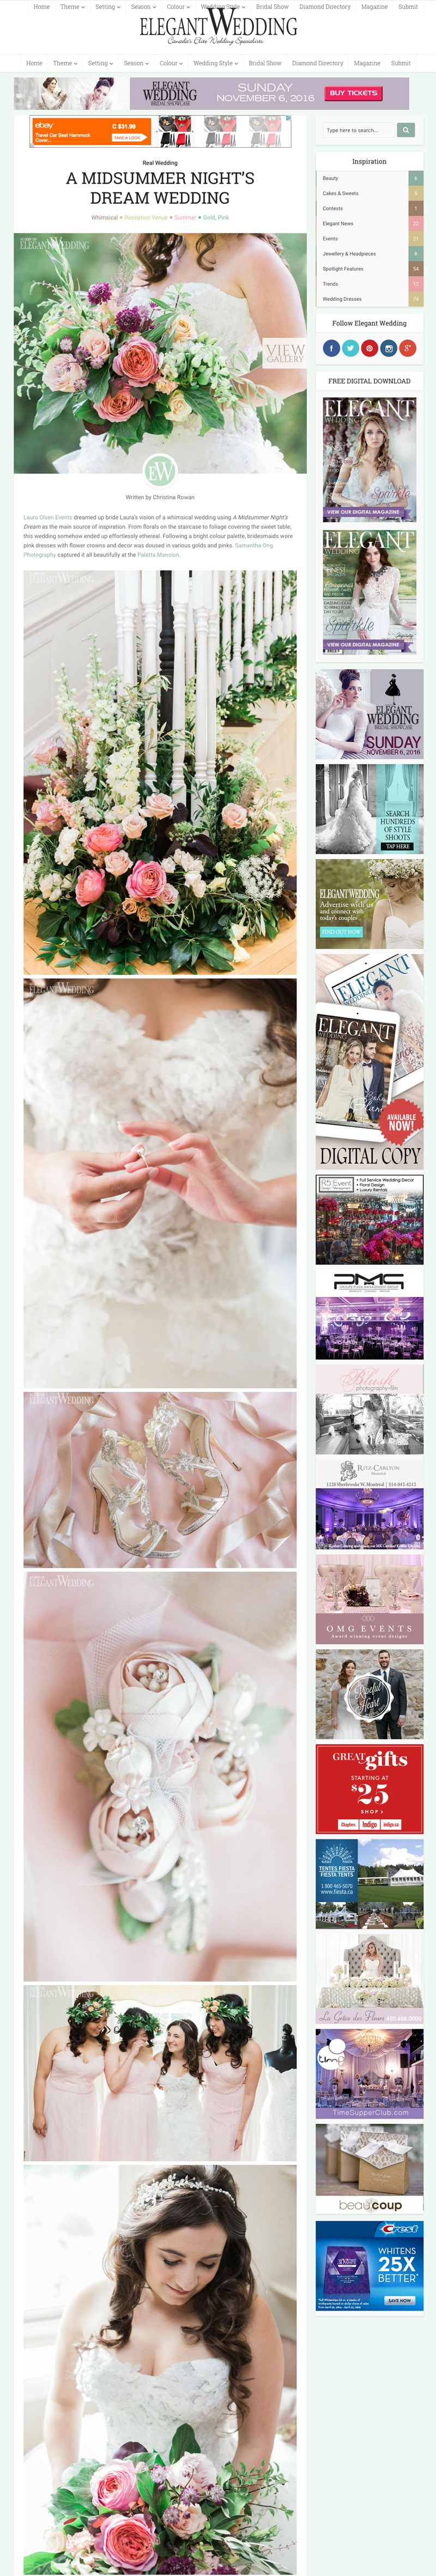 burlington-elegant-wedding-photos-paletta-mansion